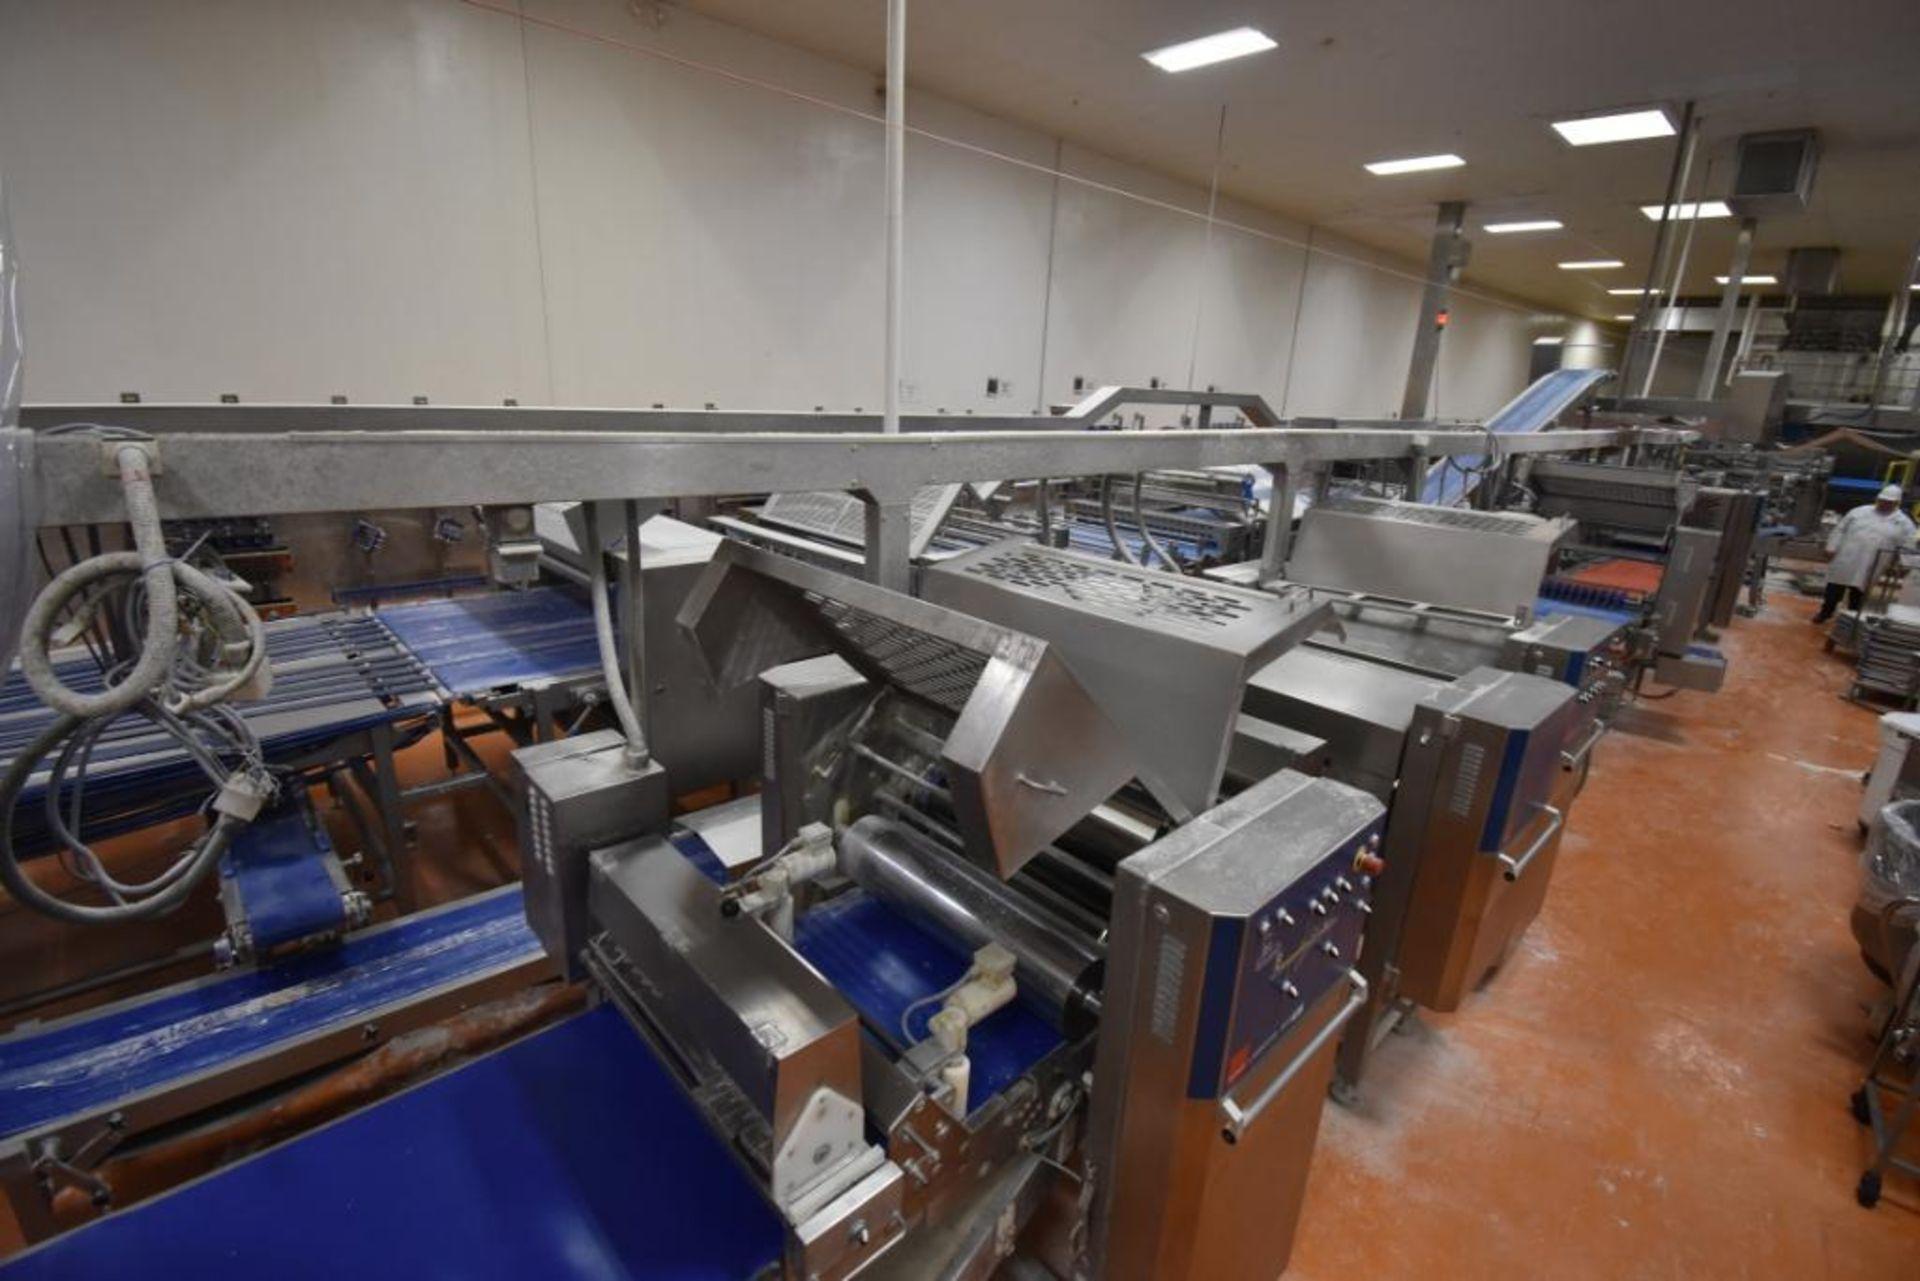 2007 Fritsch Laminator 3000 dough line - Image 262 of 280